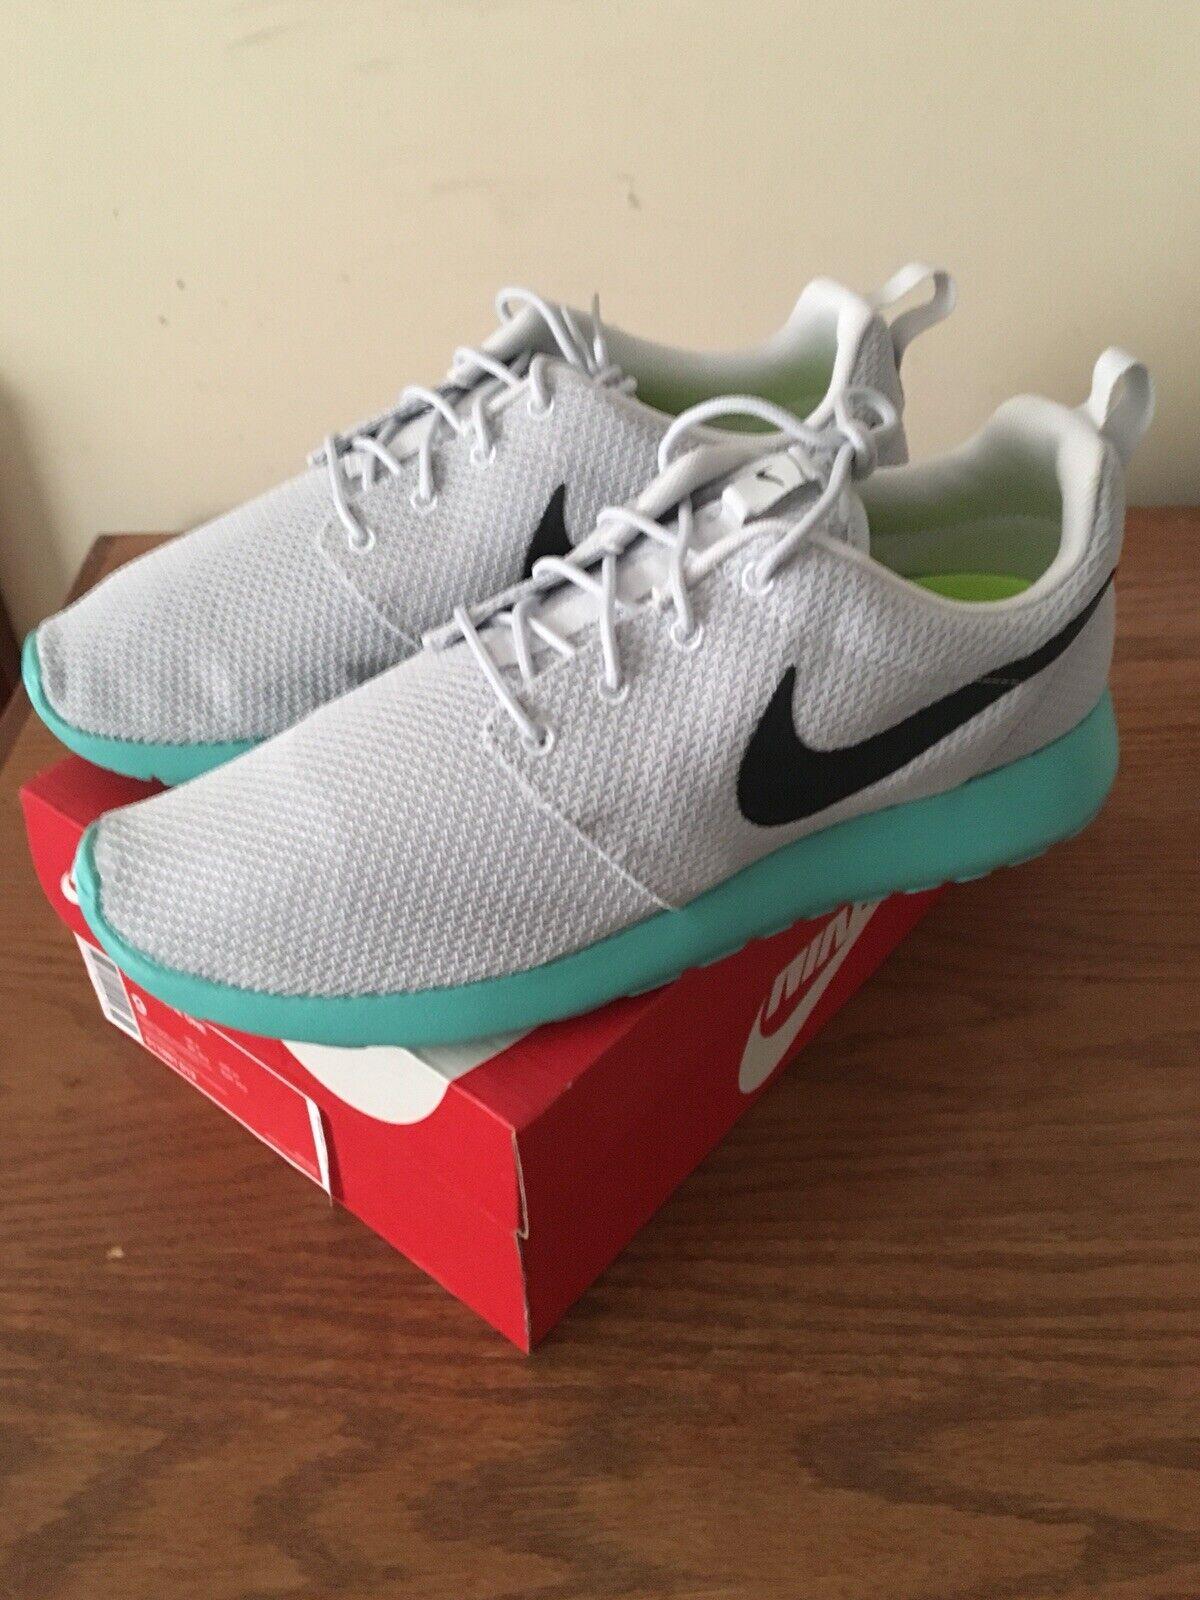 Nike Roshe One Pure Platinum Anthracite Calypso Grey Size 9 511881 013 New